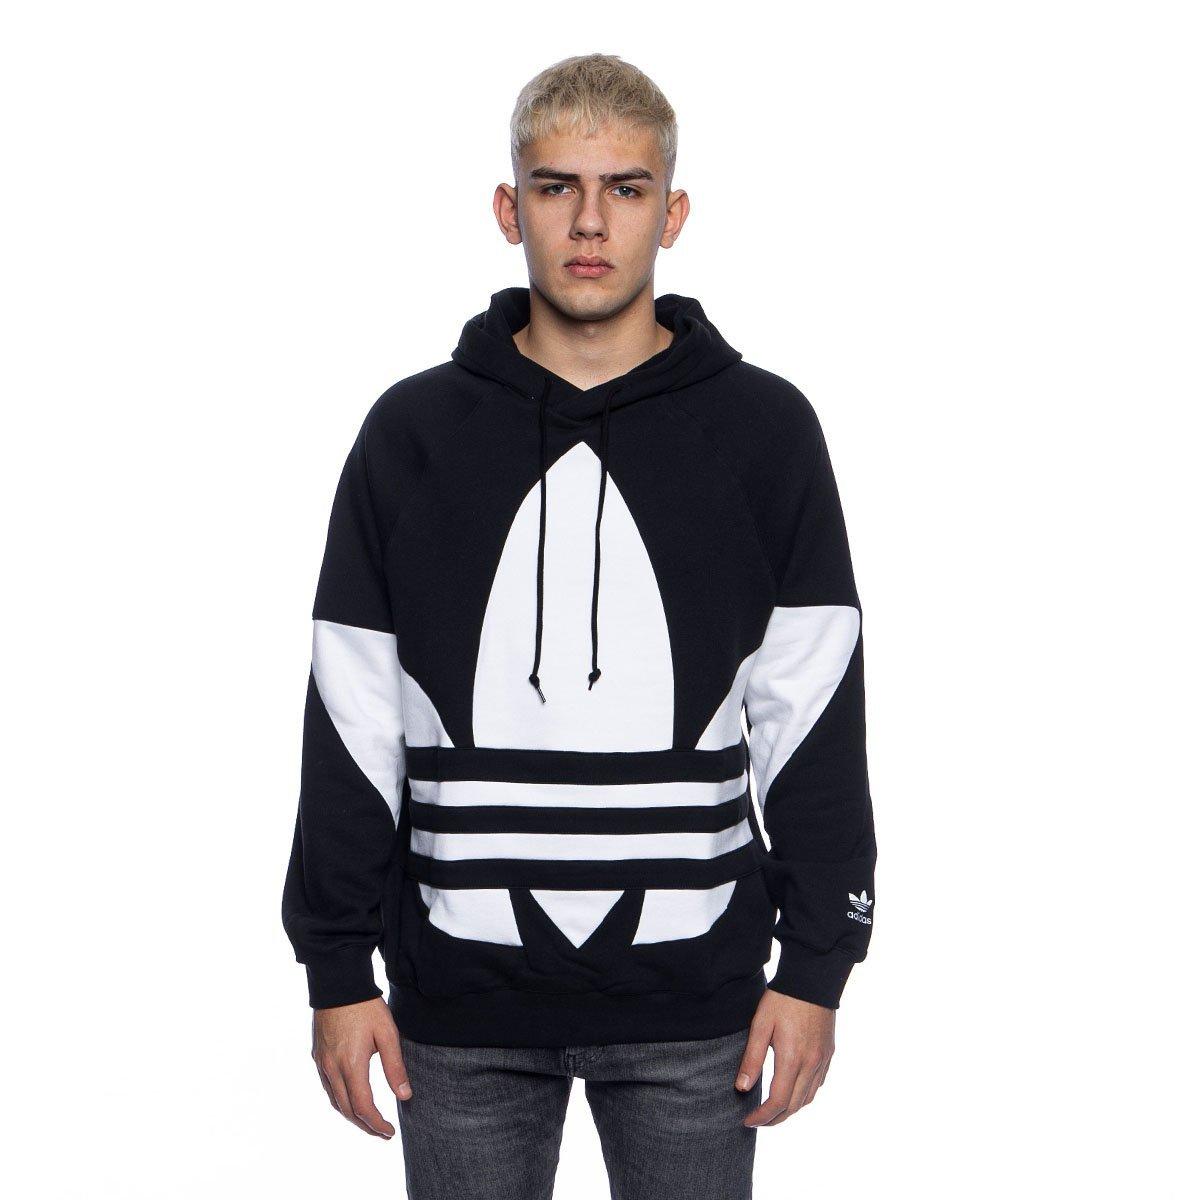 Bluza Adidas Originals Big Trefoil Hoodie black